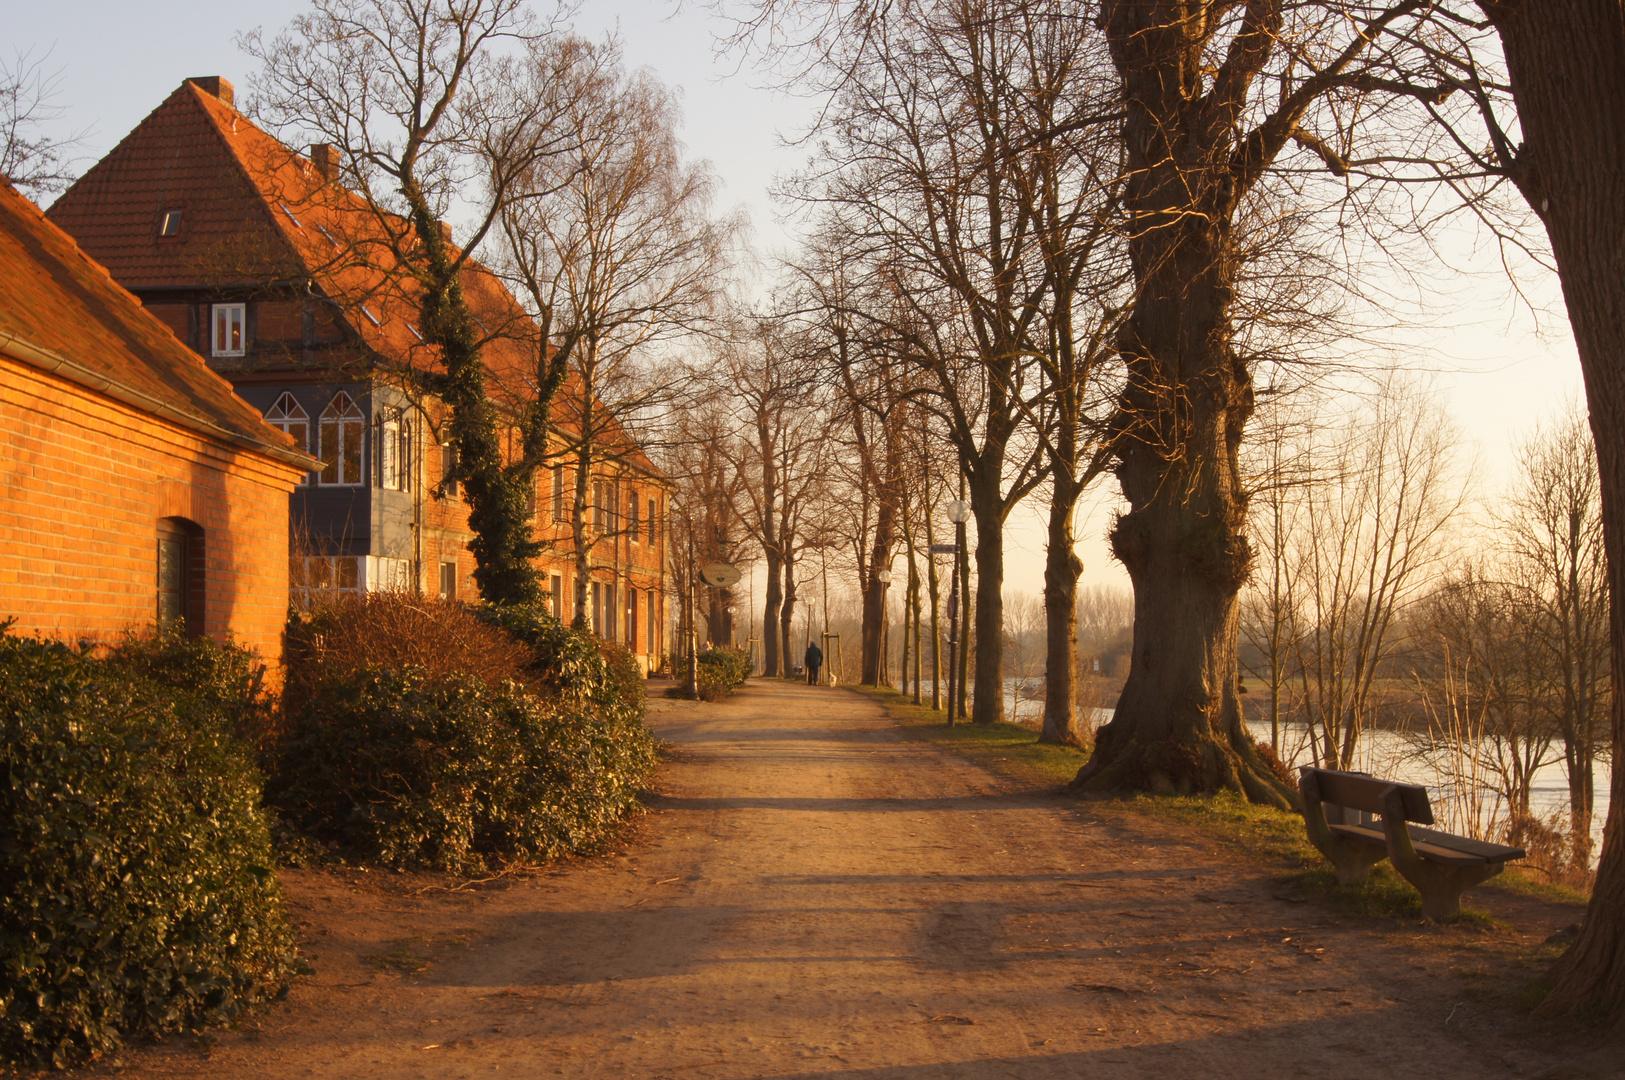 Weg an der Weser bei Nienburg